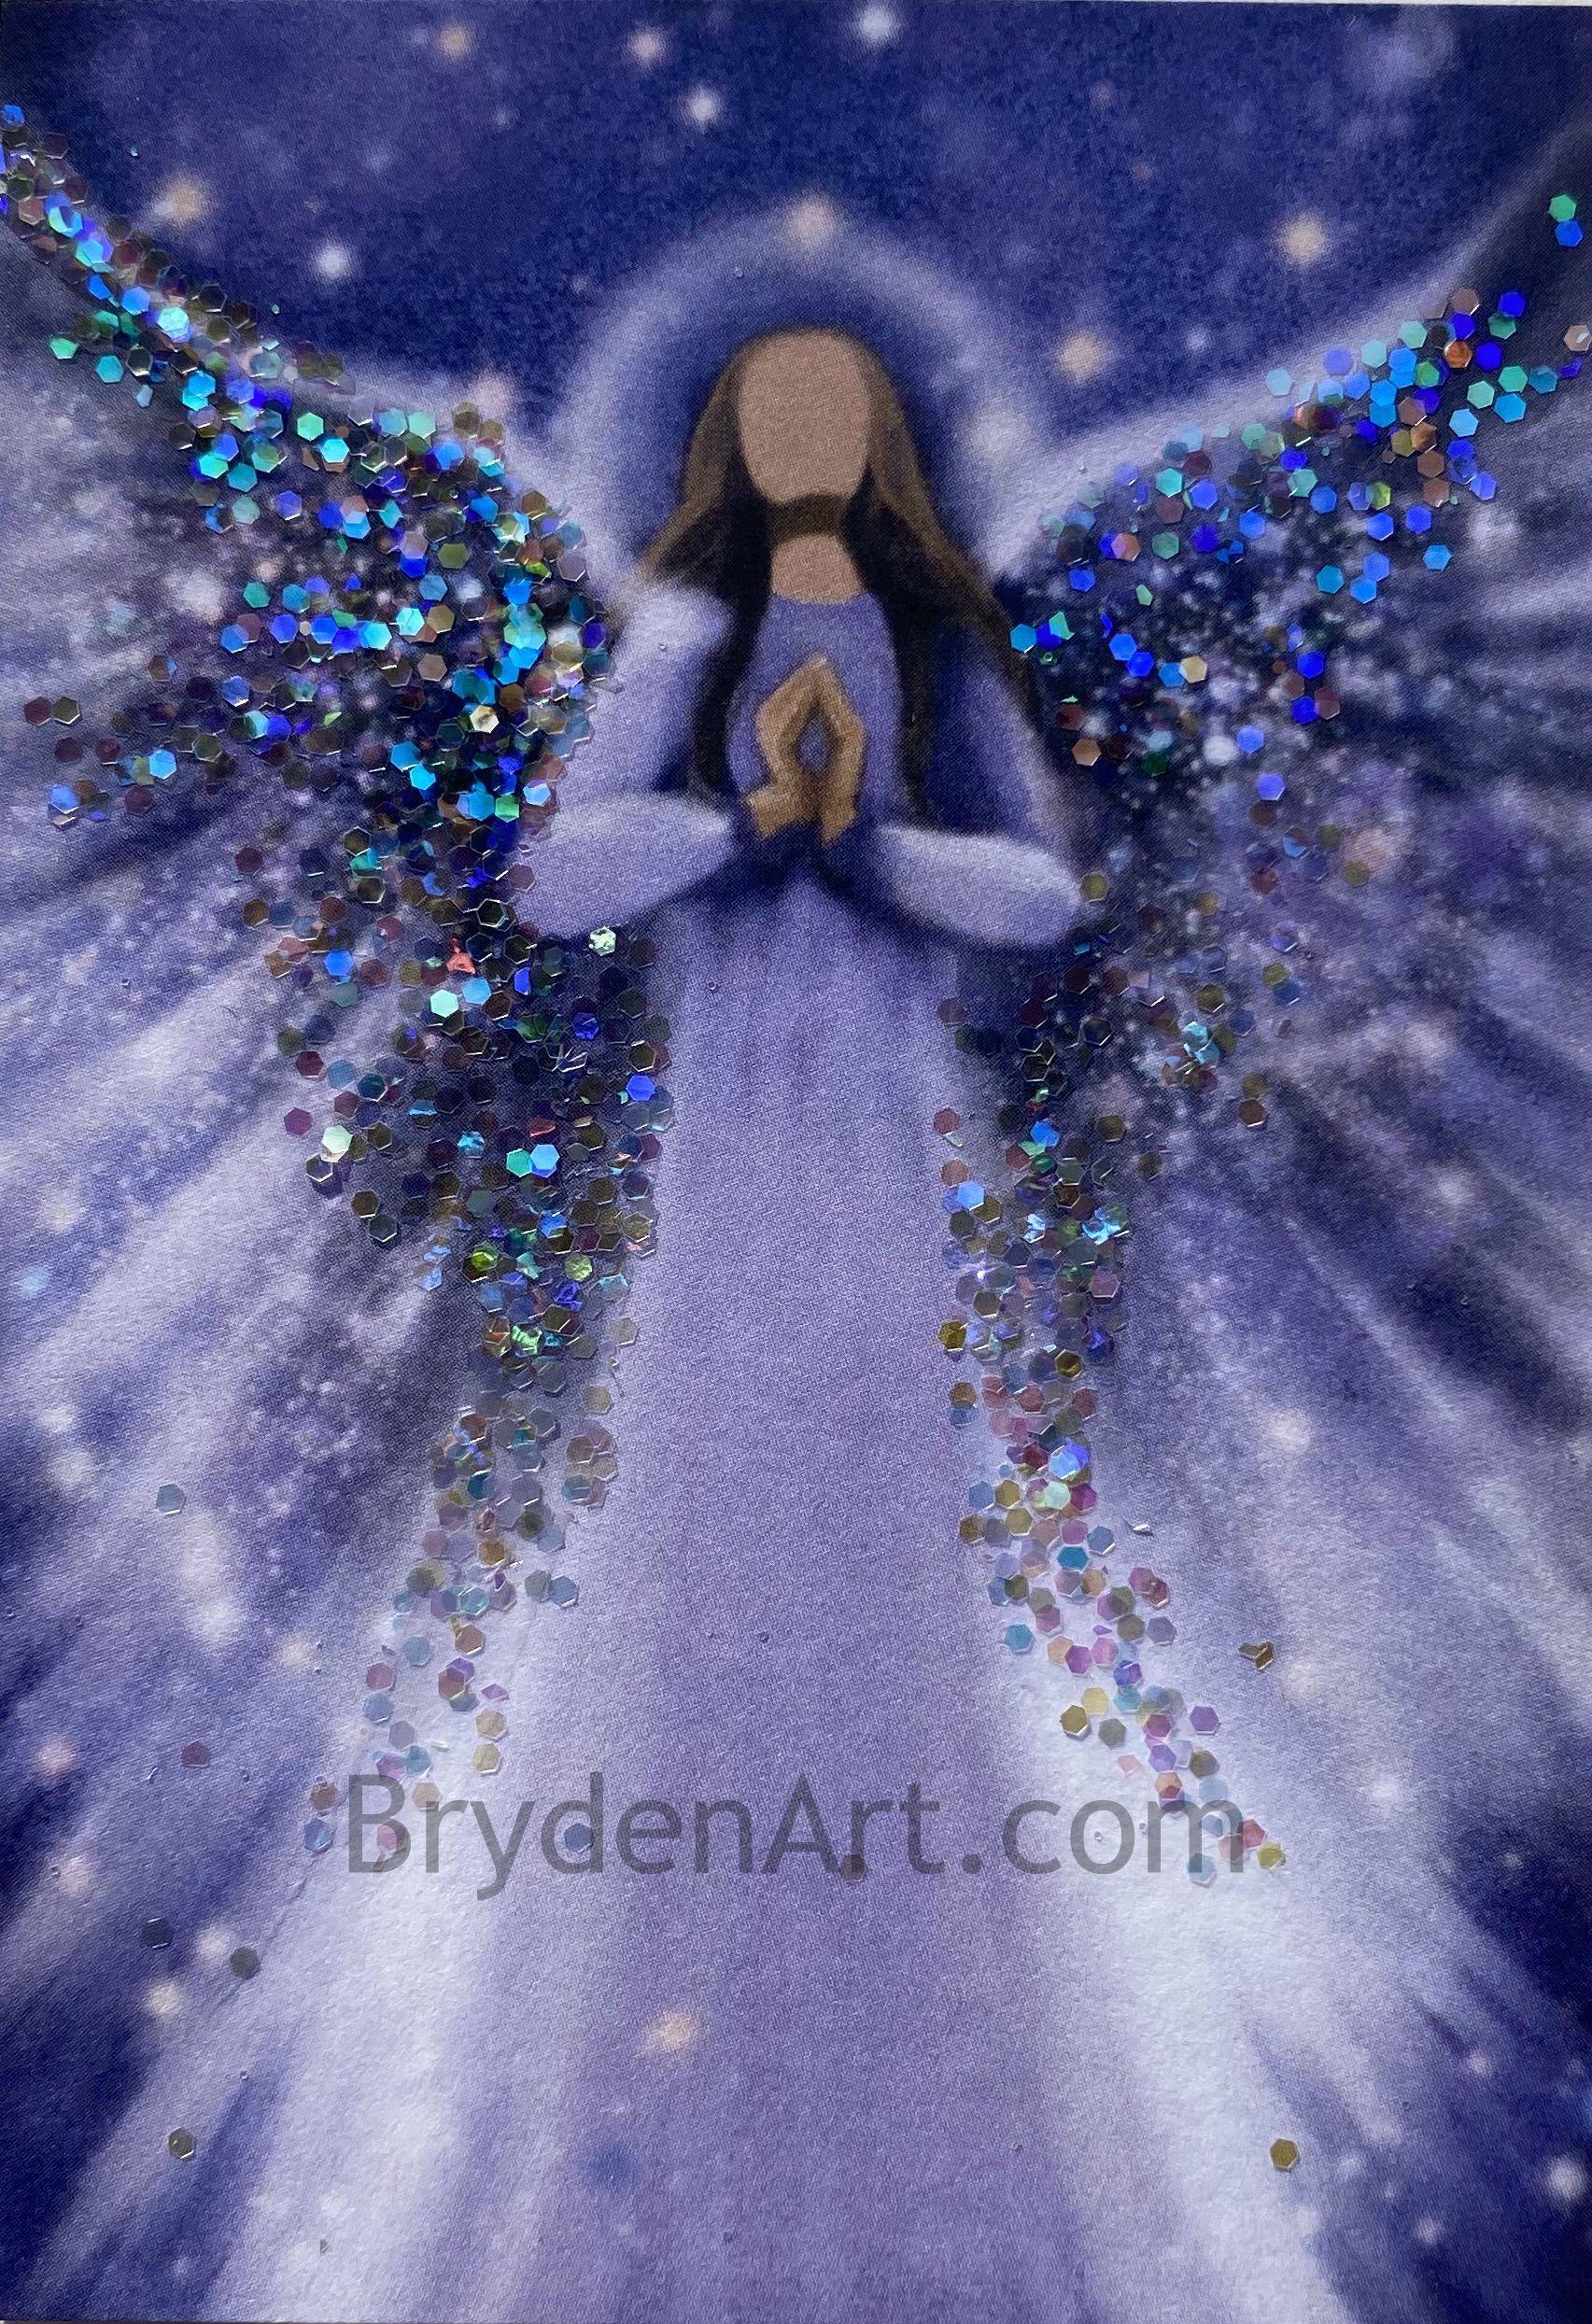 Glittered PRINT ACEO Angel Miniature Spiritual Inspirational CapeCodArtist